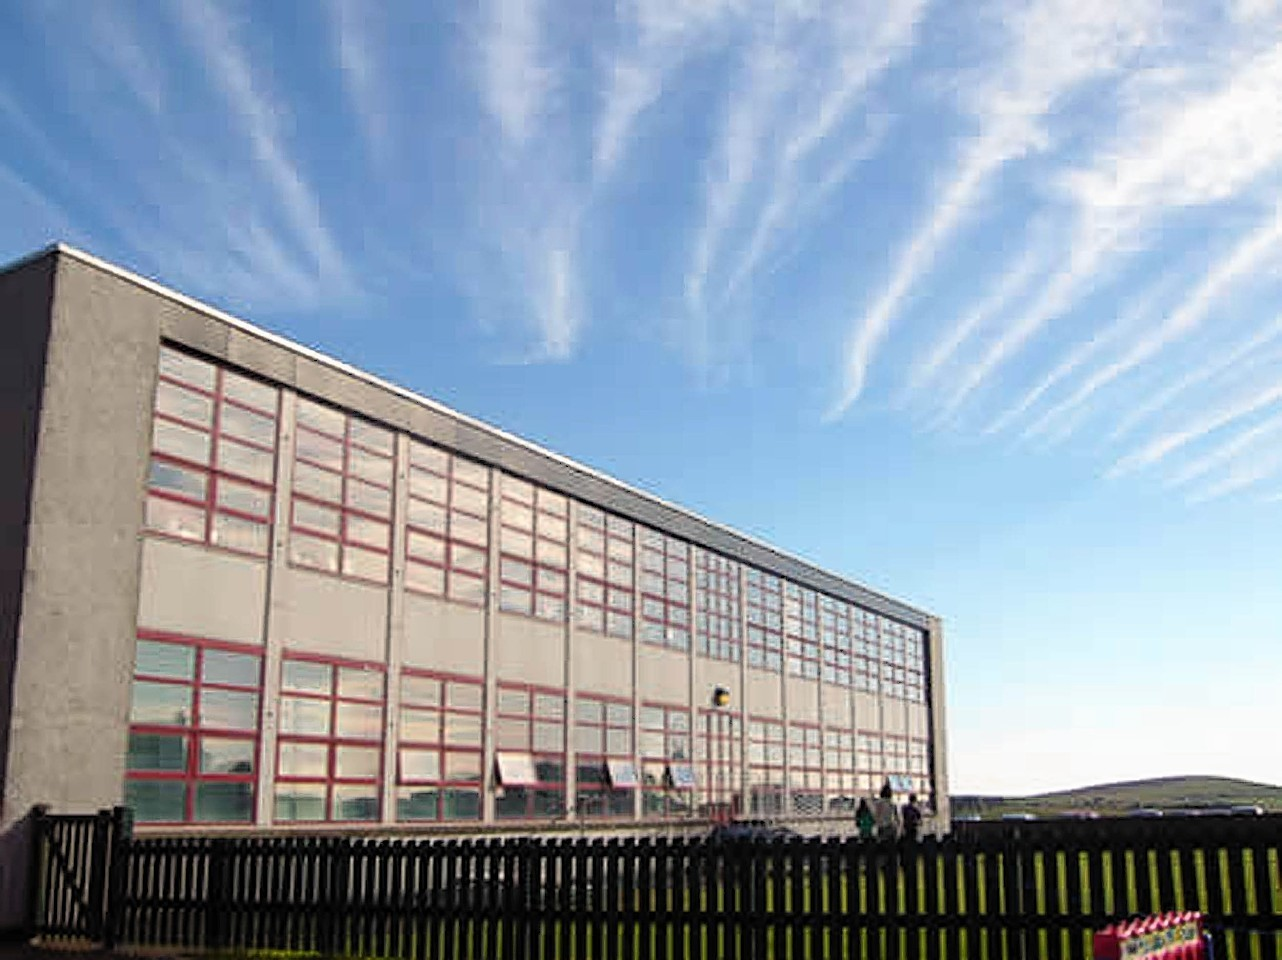 Baltasound Junior High School on the Shetland island of Unst